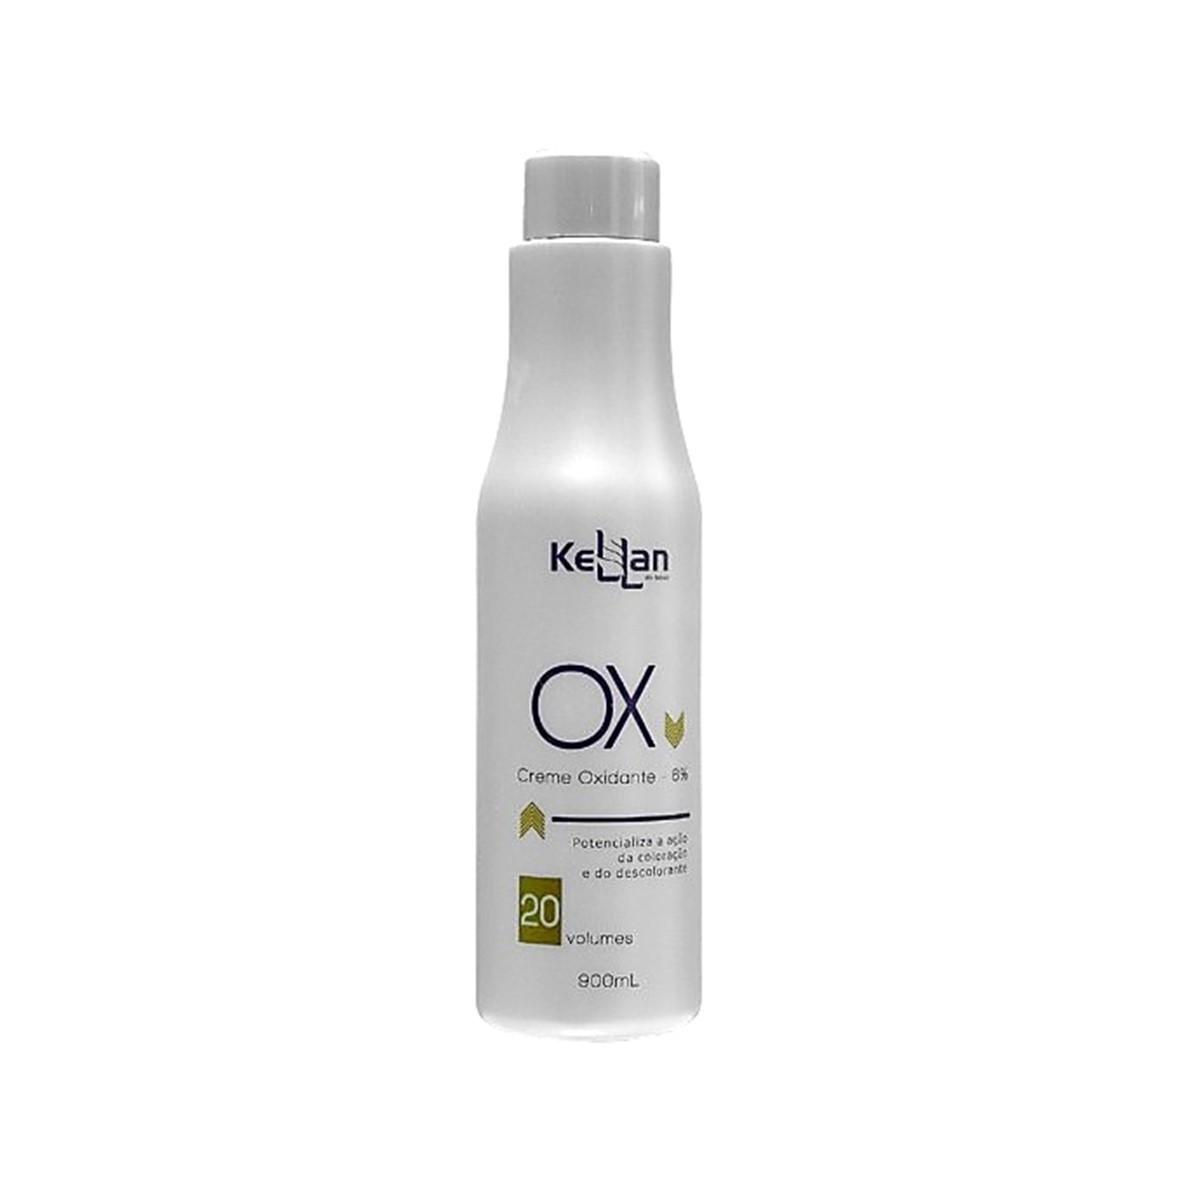 Kellan Creme Oxidante Ox 20 volume 900ml - Àgua Oxigenada